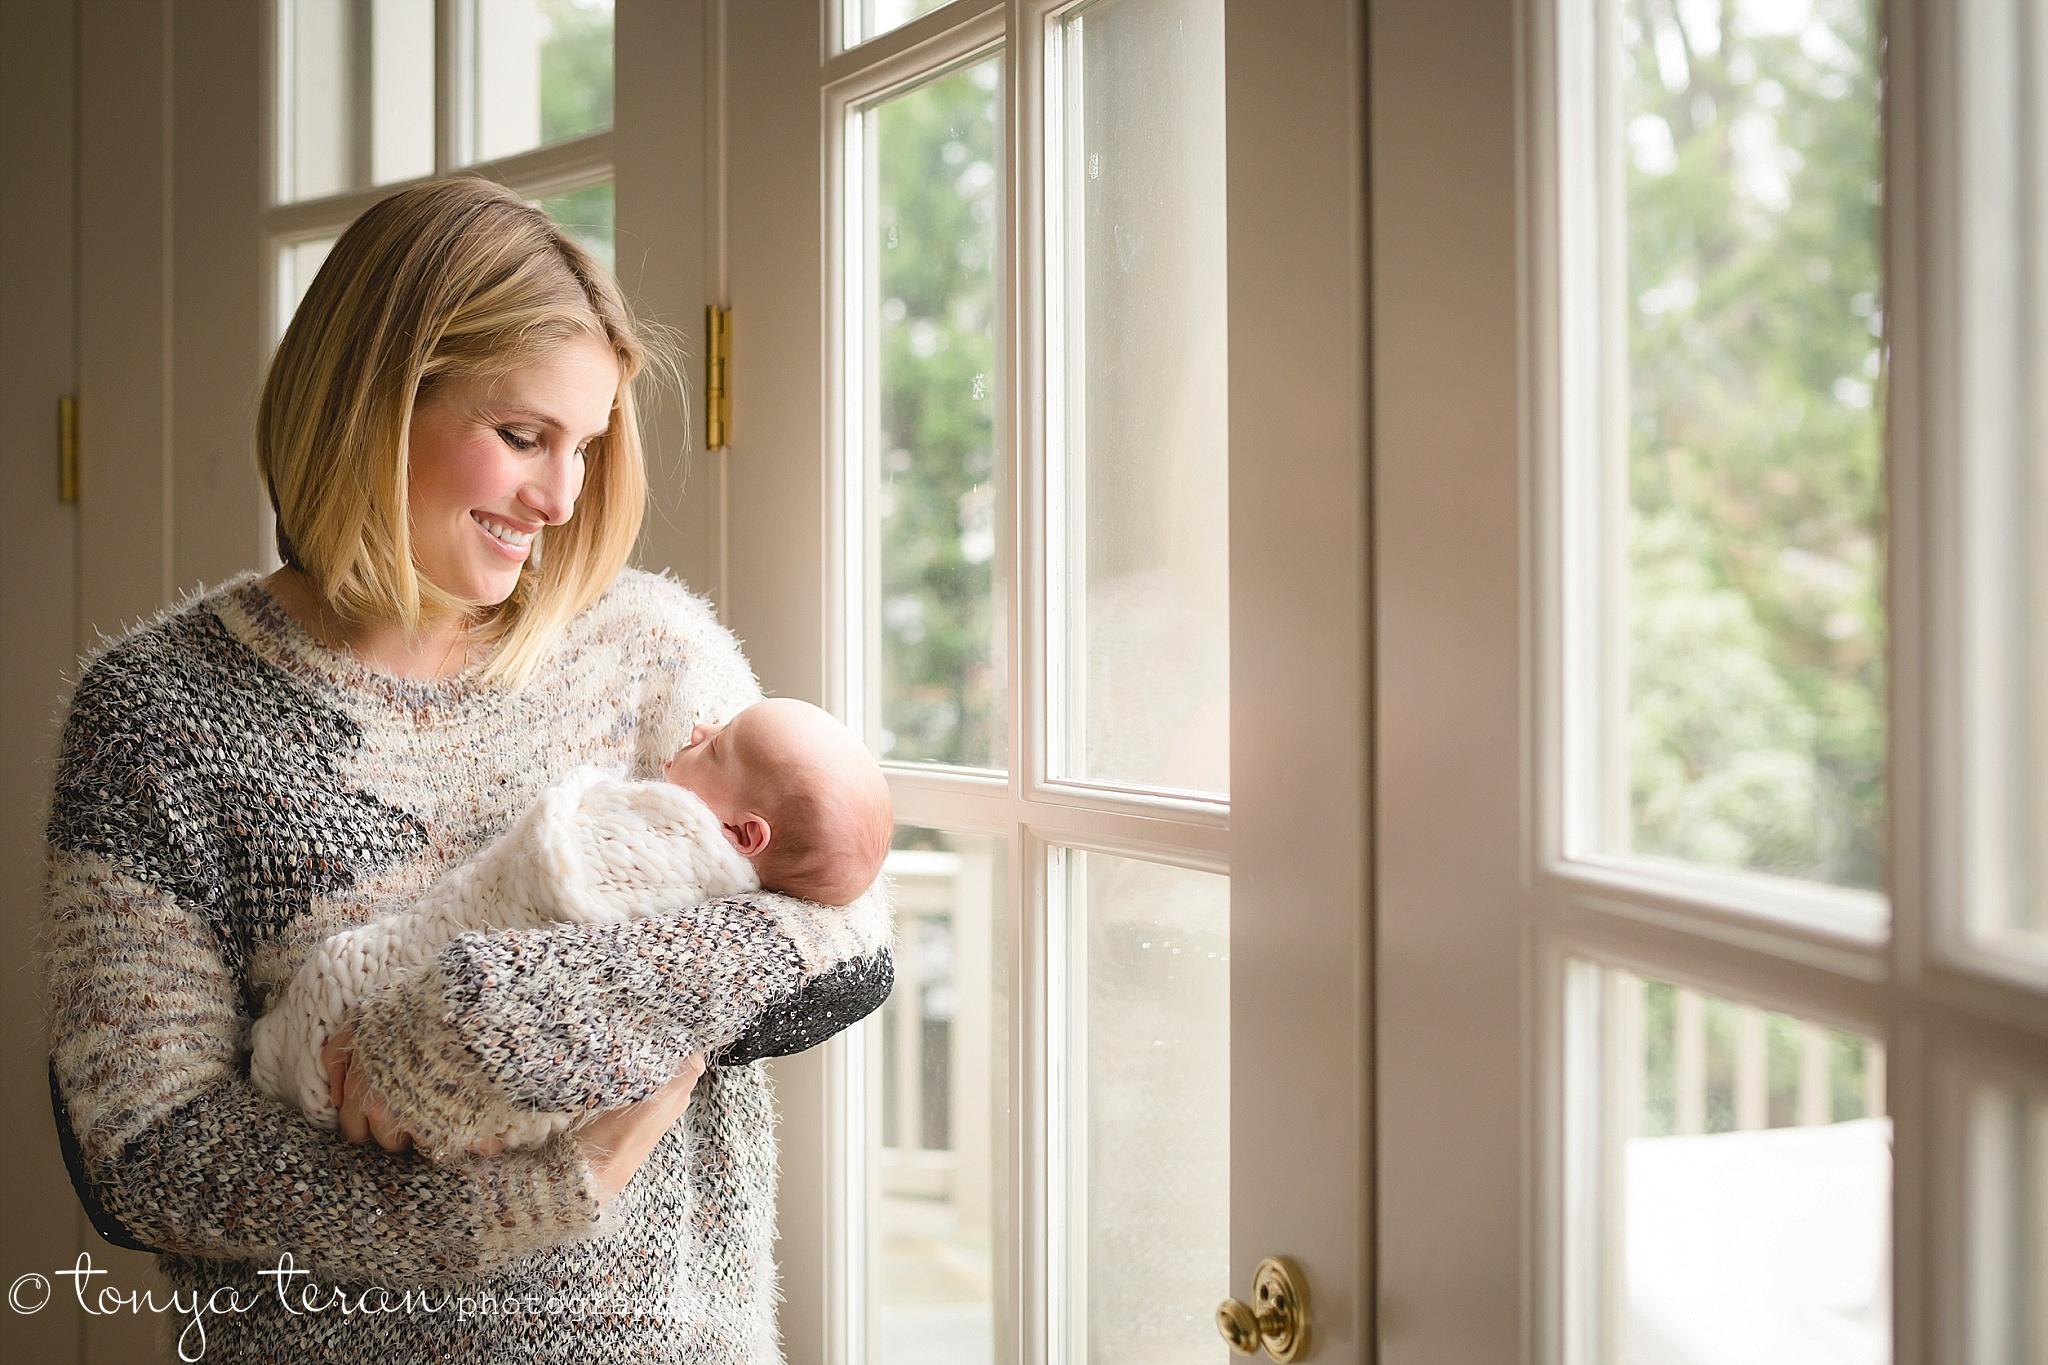 Family Newborn Photo Session   Tonya Teran Photography, Gaithersburg, MD Newborn, Baby, and Family Photographer